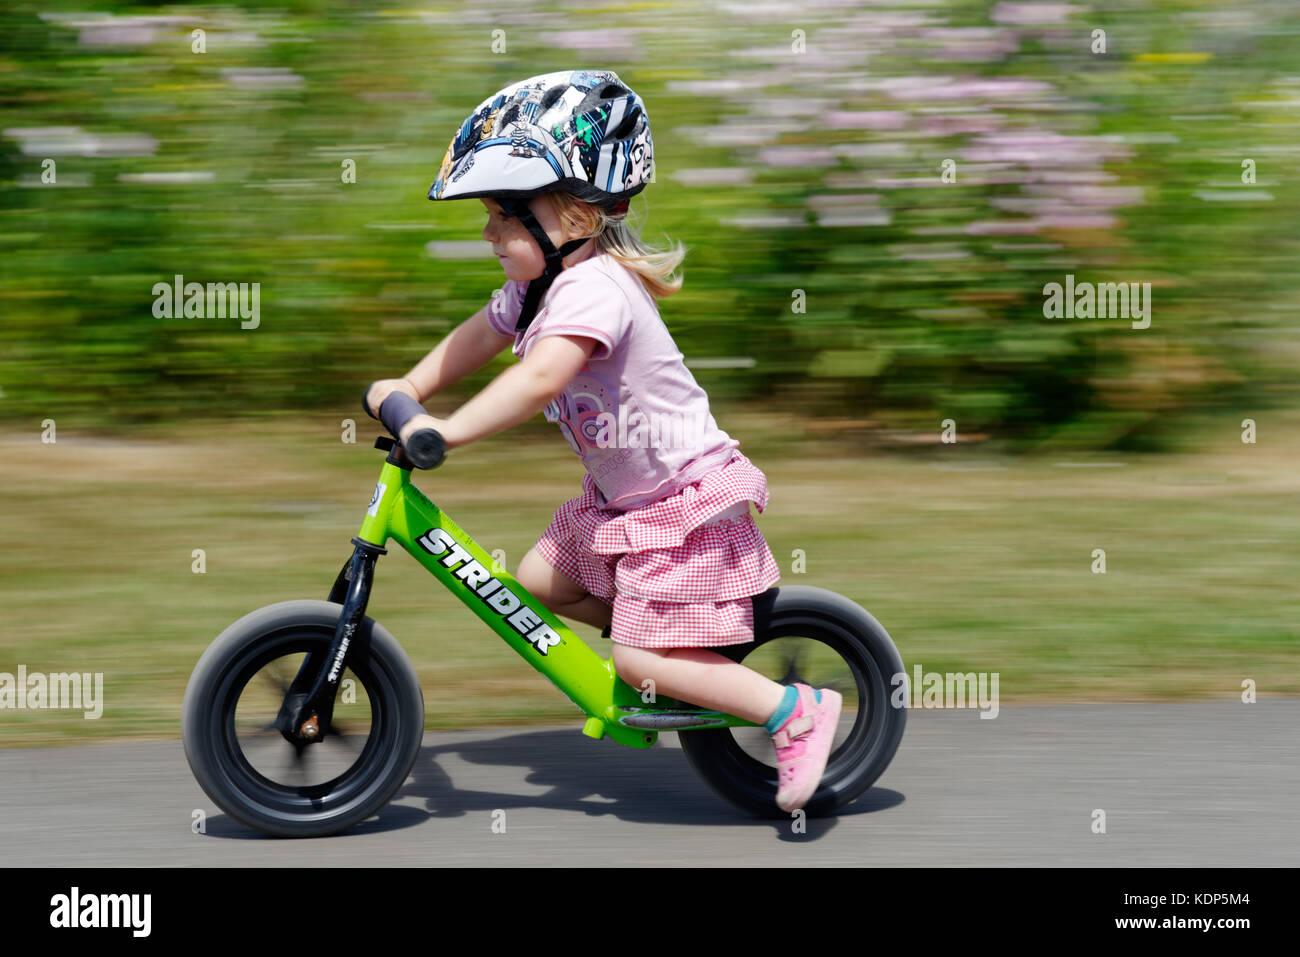 a-three-year-old-girl-riding-a-balance-bike-KDP5M4.jpg